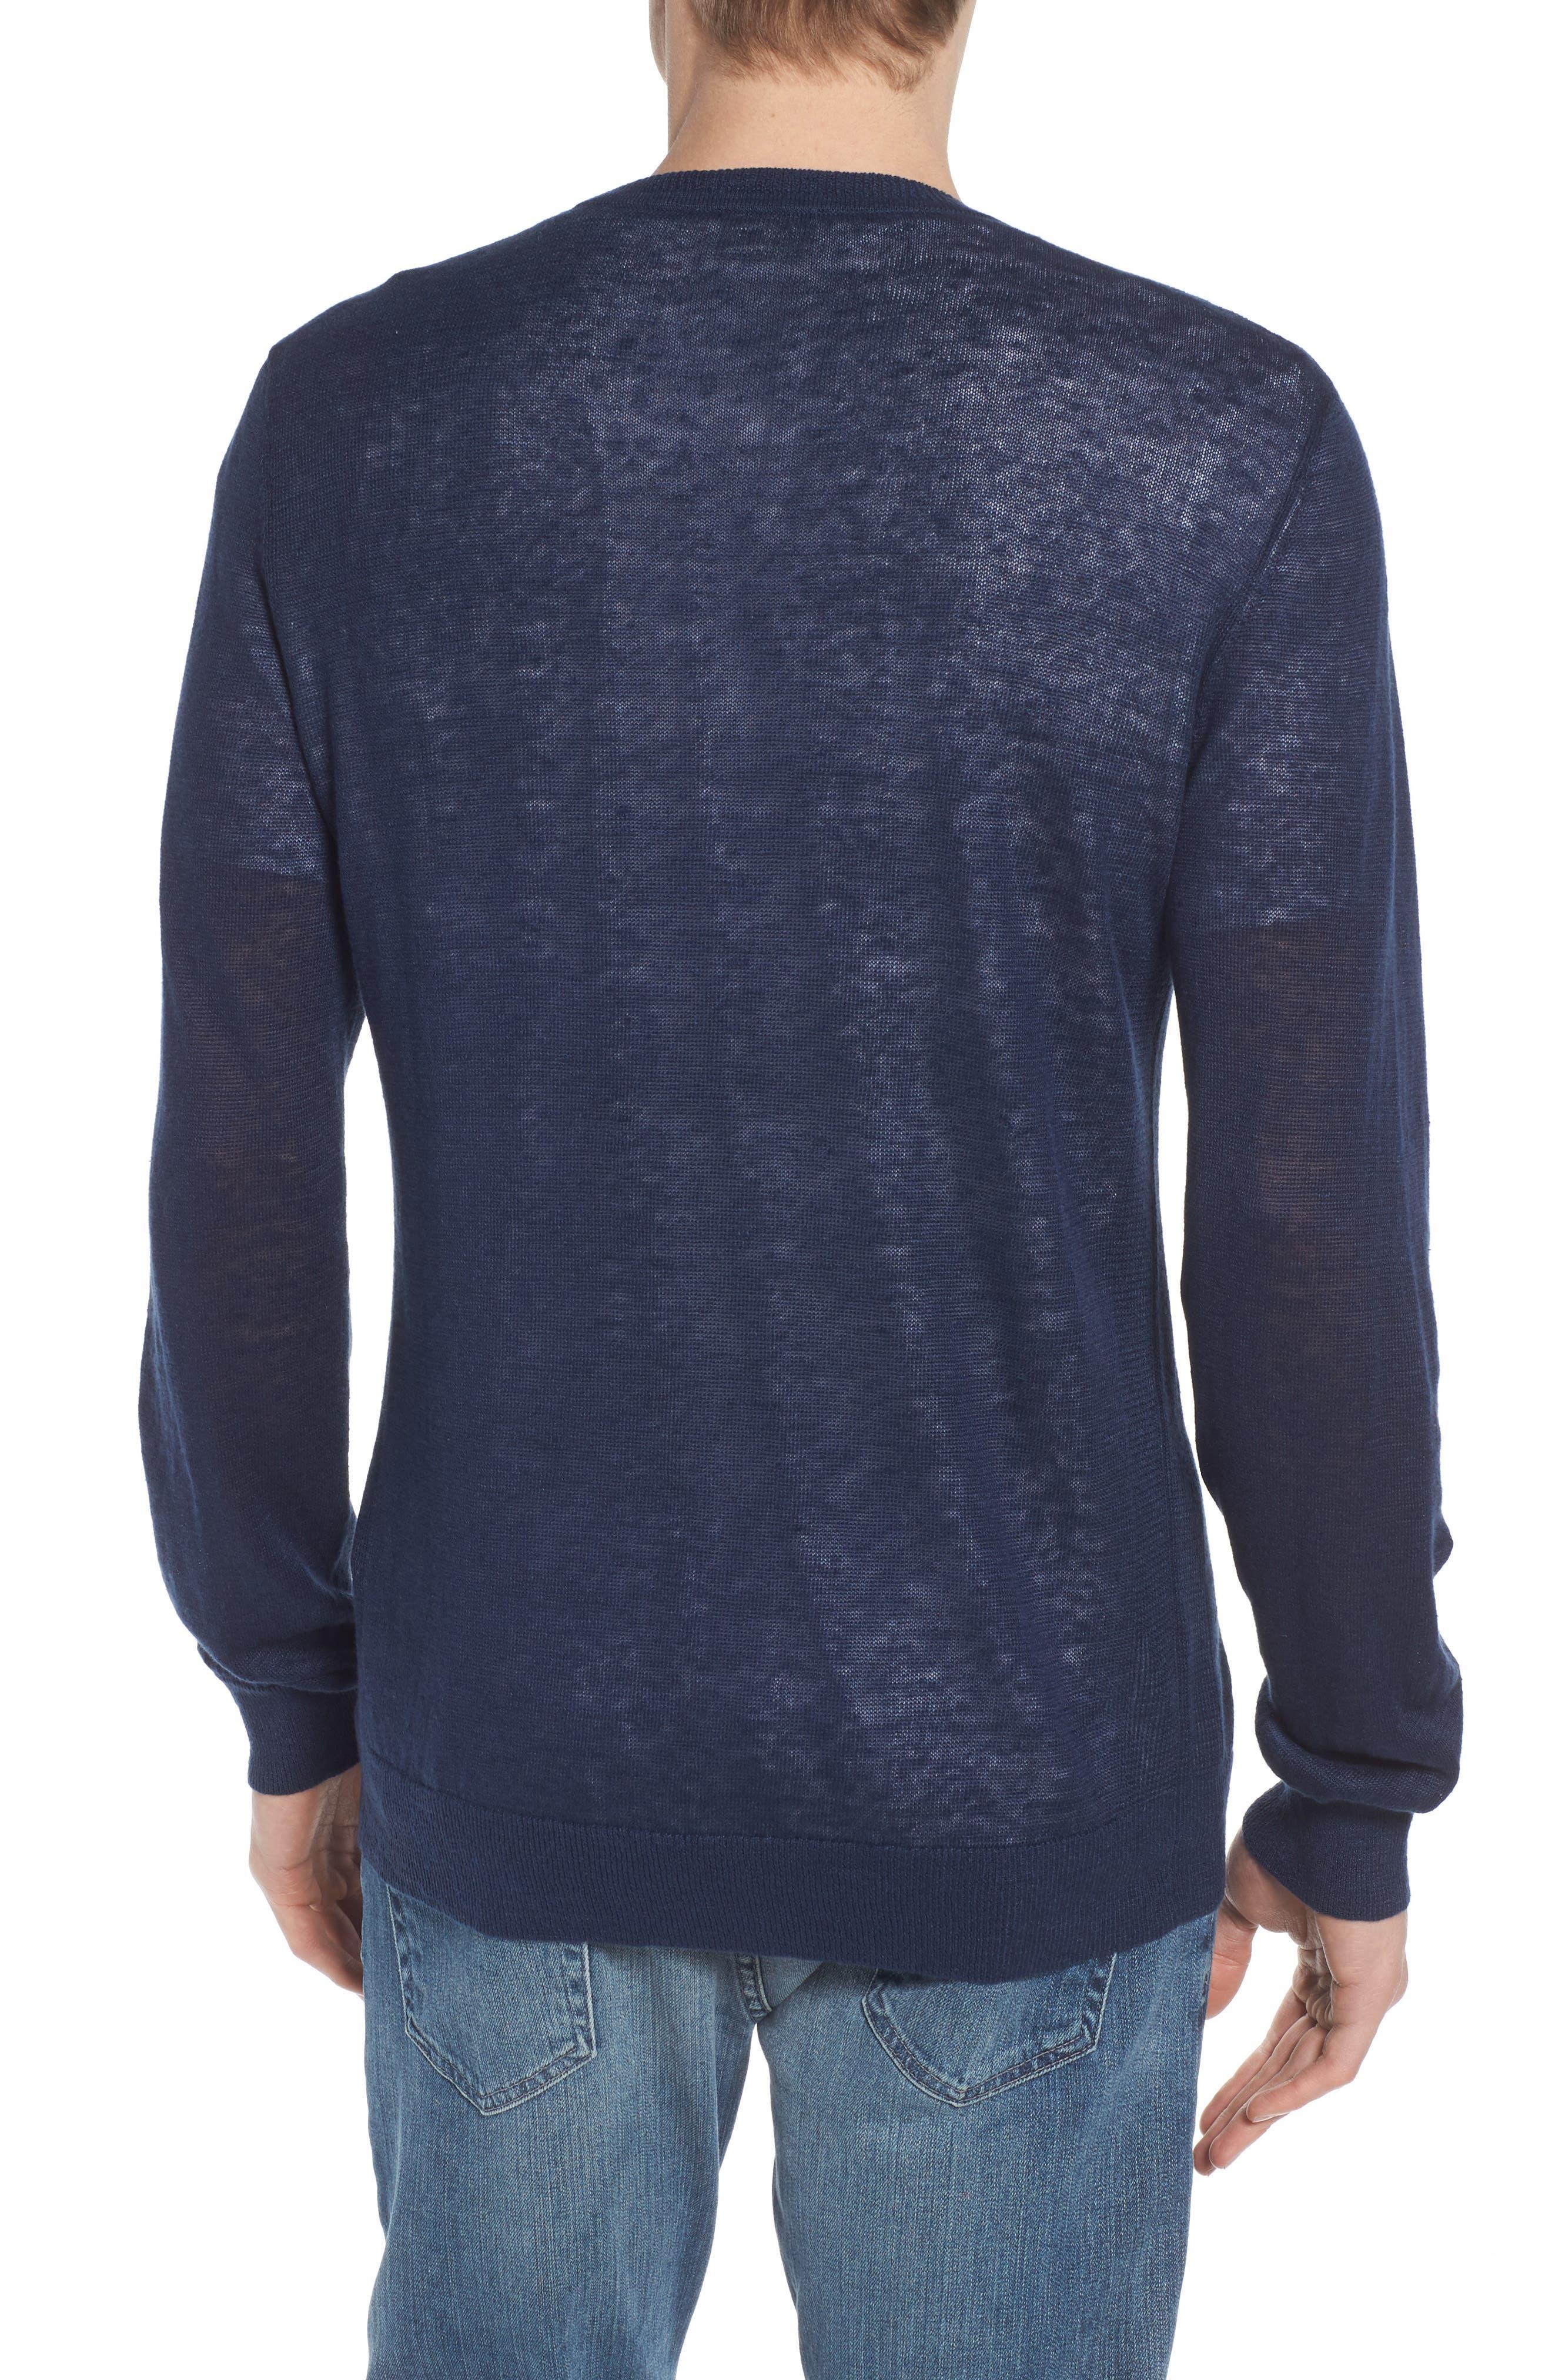 Heyward Long Sleeve T-Shirt,                             Alternate thumbnail 4, color,